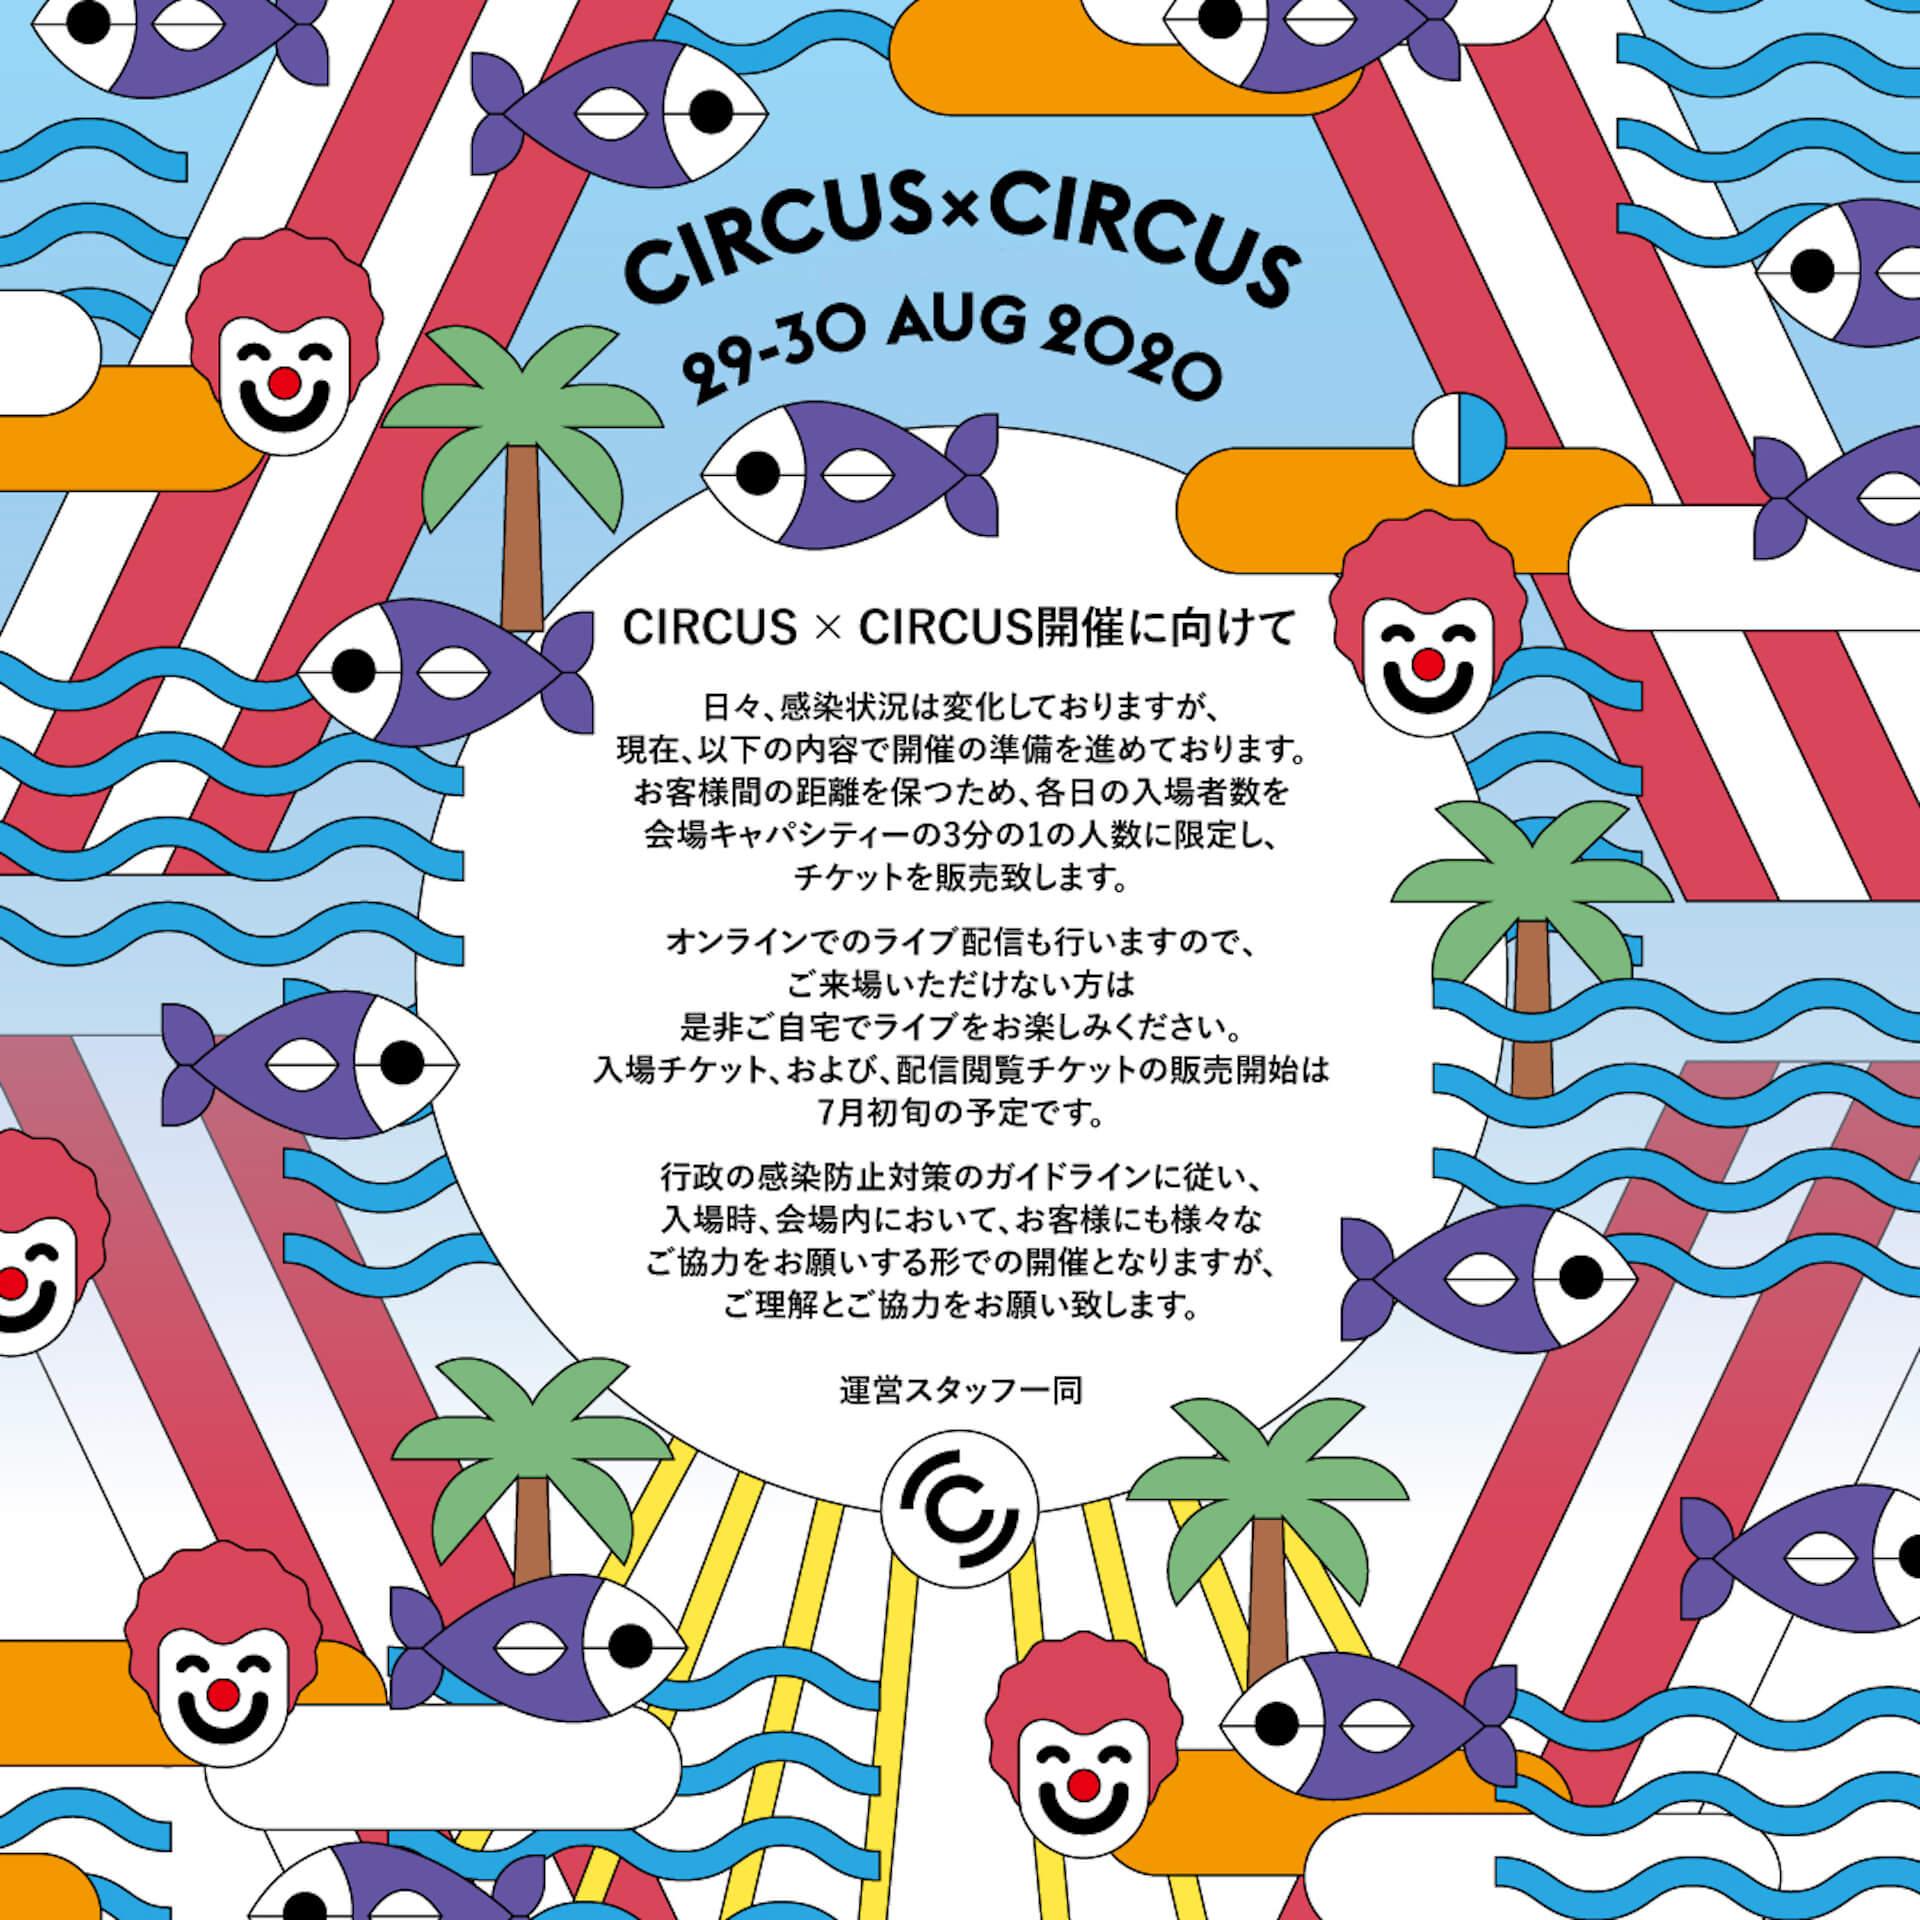 SIRUP、釈迦坊主、Tohji、tofubeats、chelmicoらが出演!<CIRCUS × CIRCUS>が8月に開催決定 music200610_circuscircus_1